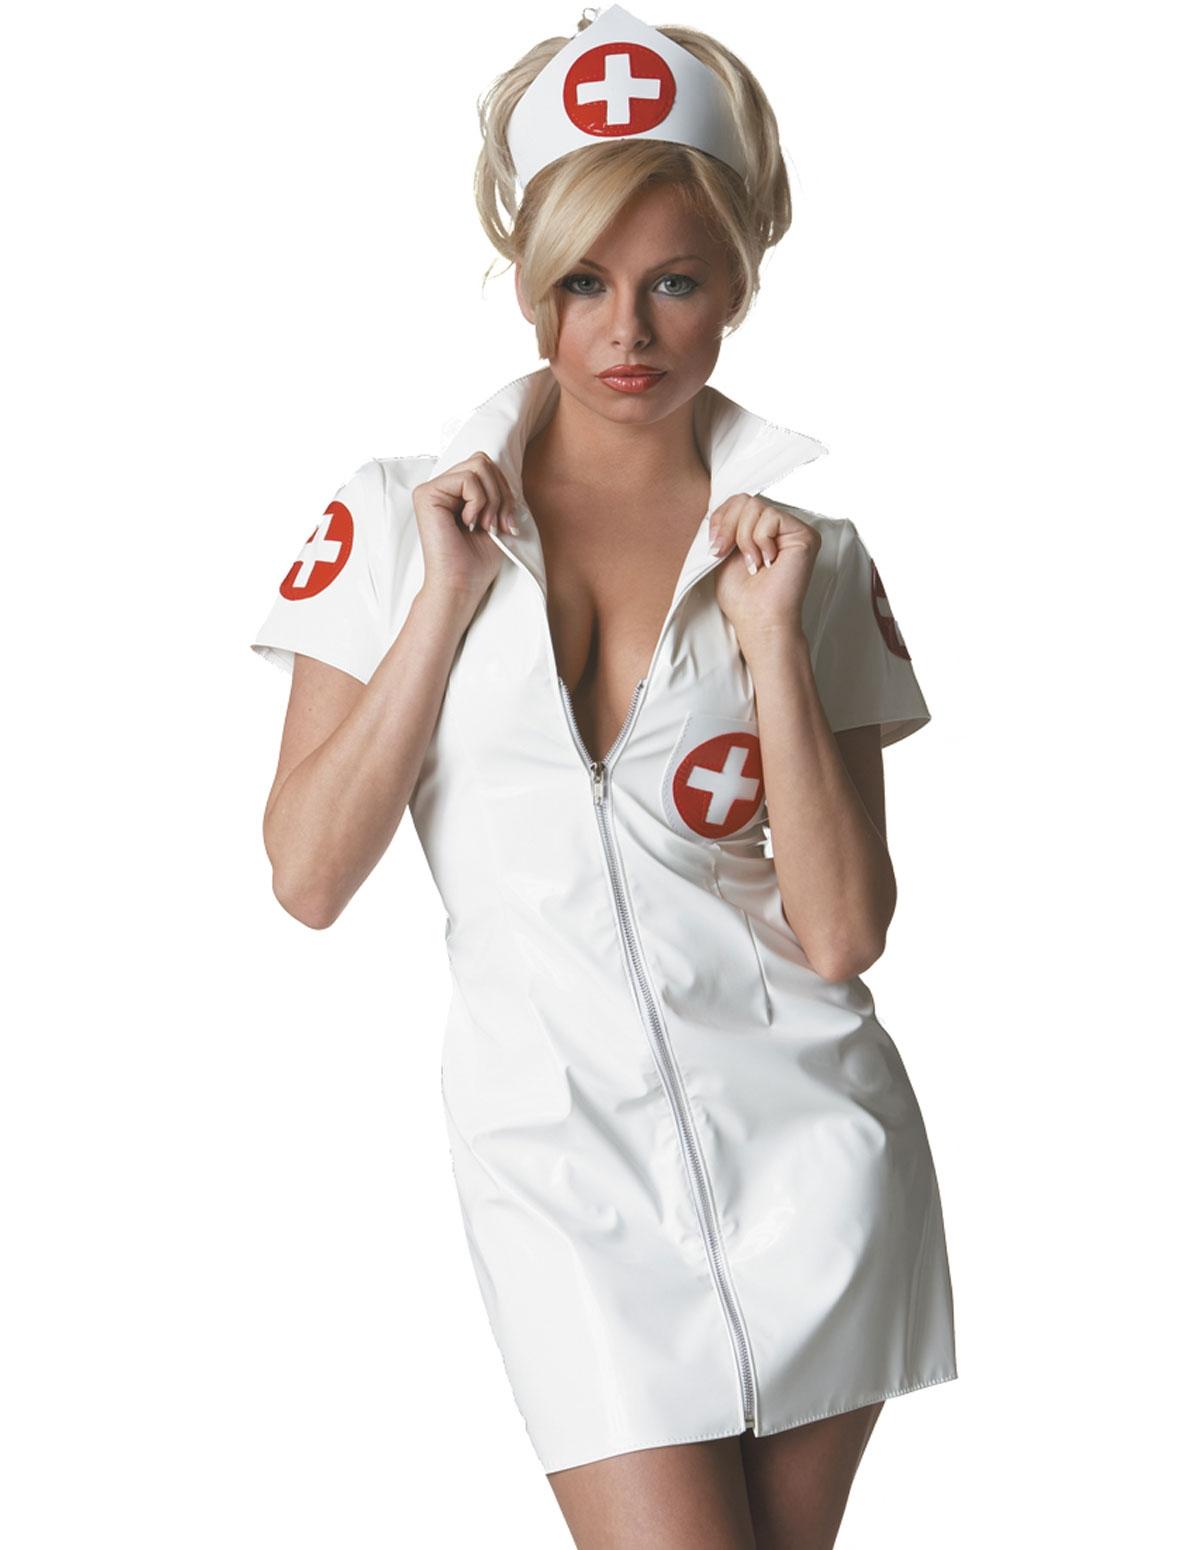 Vinyl Nurse Costume